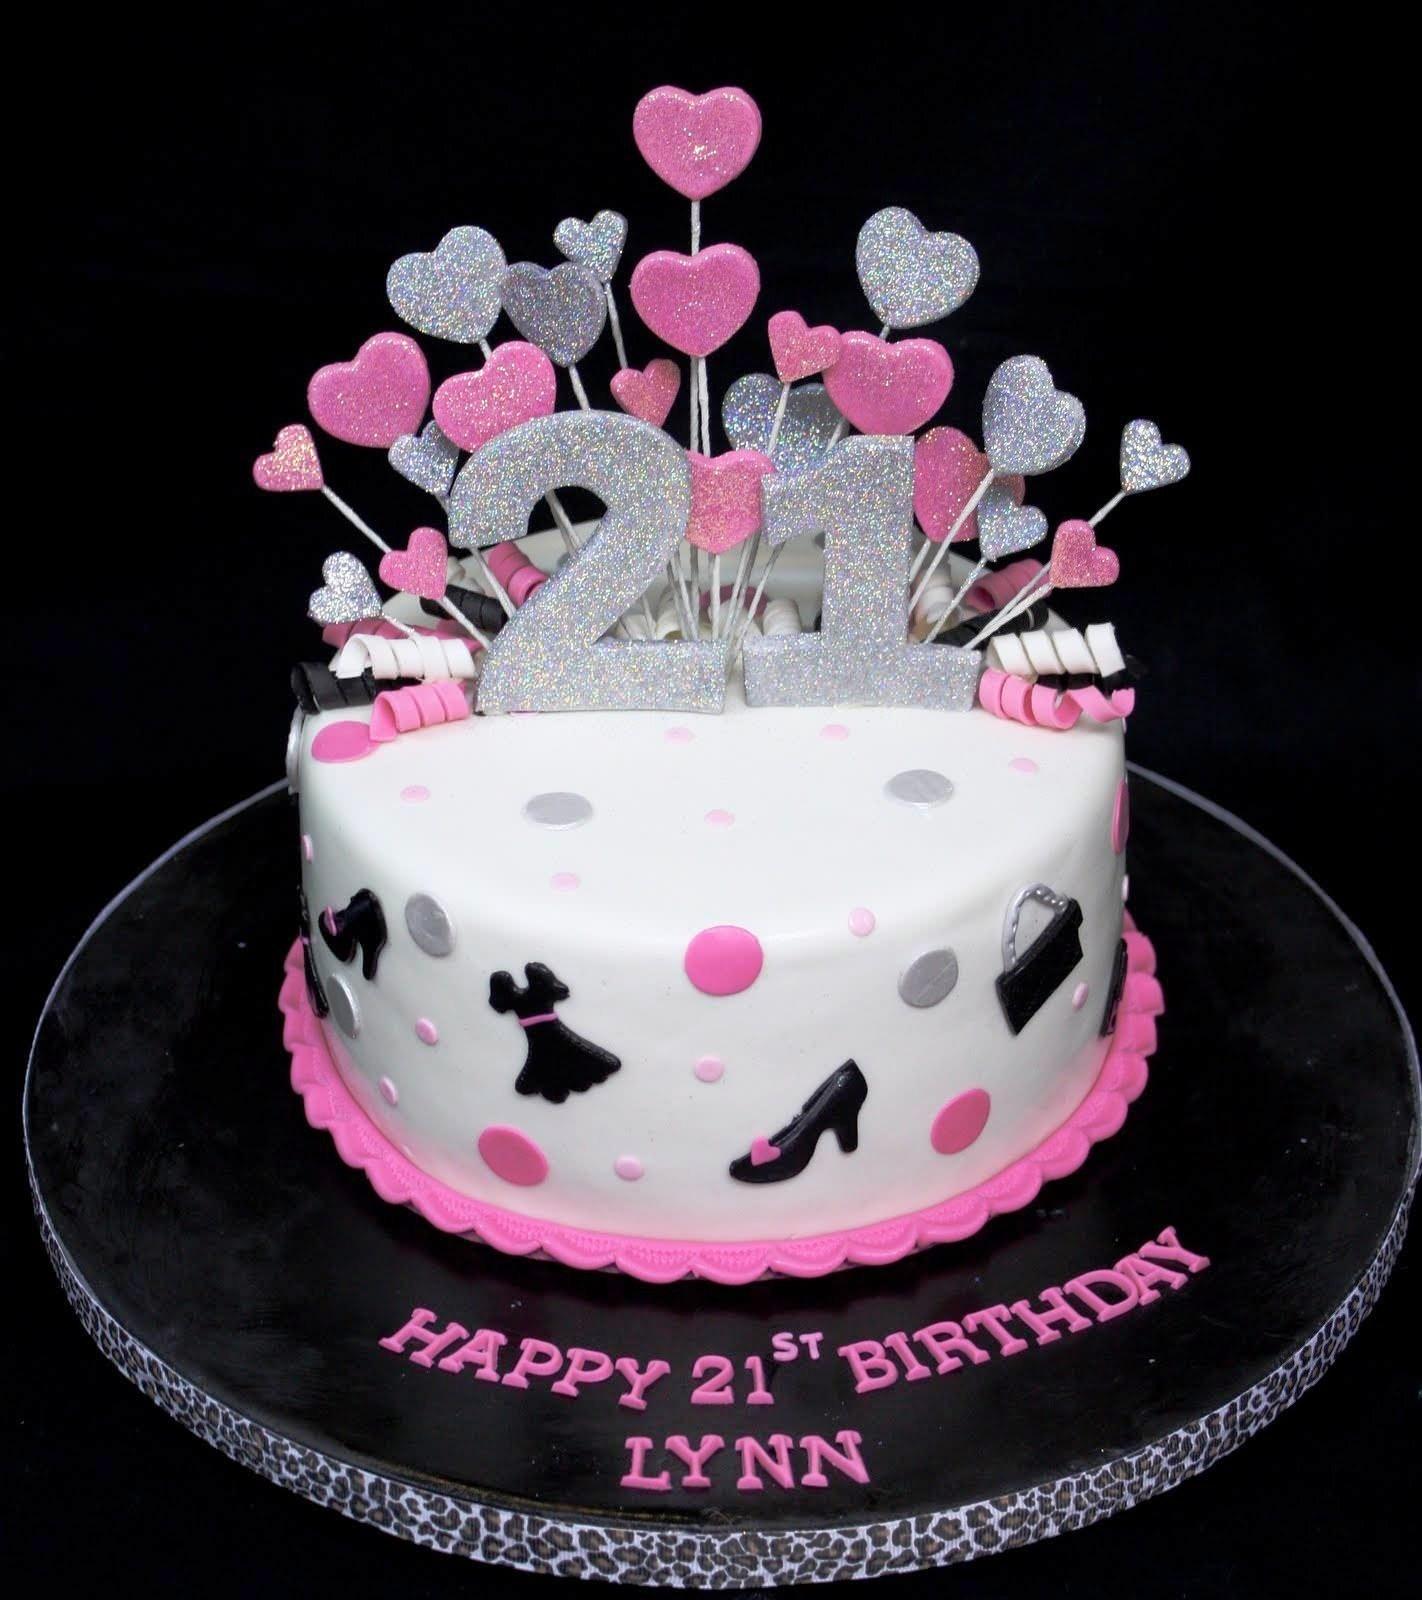 10 Spectacular 21St Birthday Ideas For Girls 21st birthday cake ideas for girls protoblogr design 21st 2021